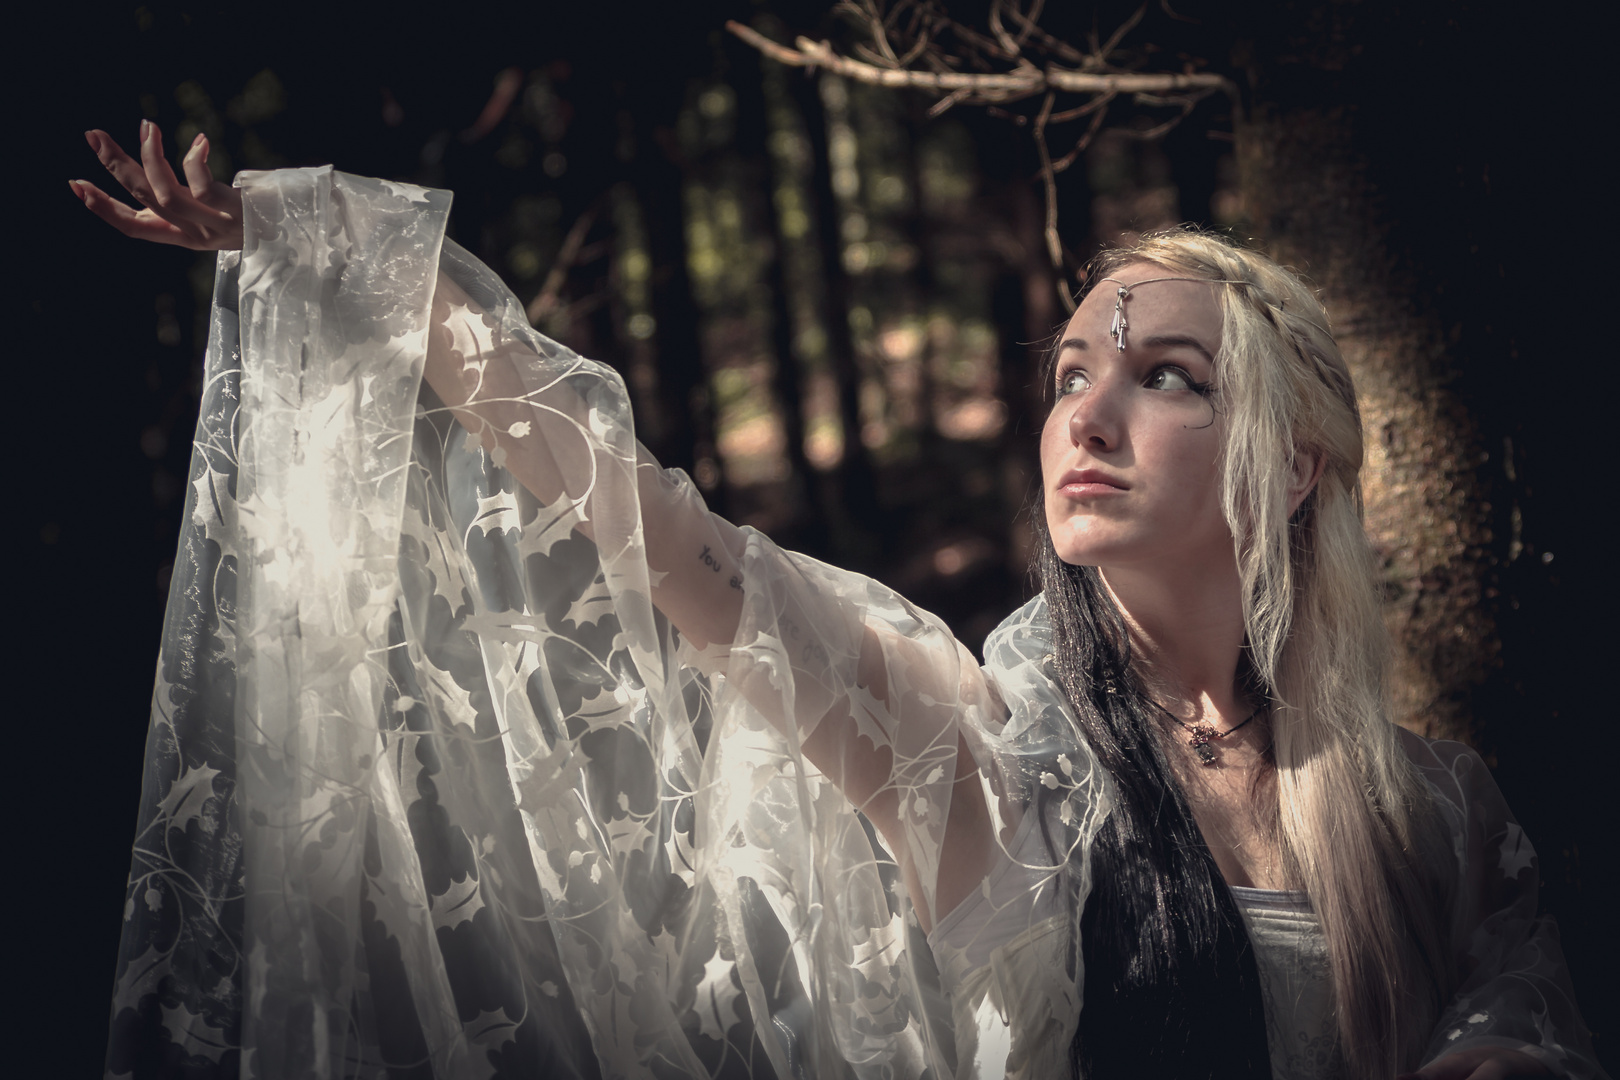 Fairytale I